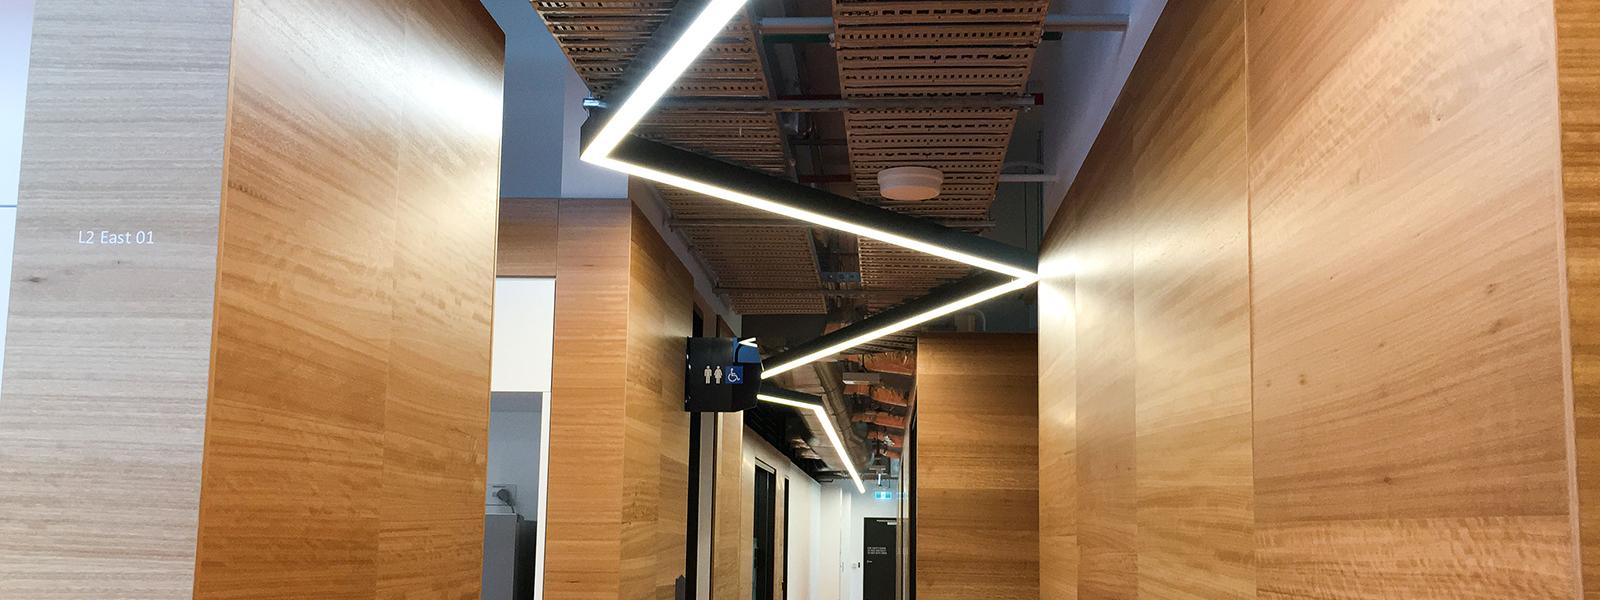 CSIRO ACT Consolidation Project